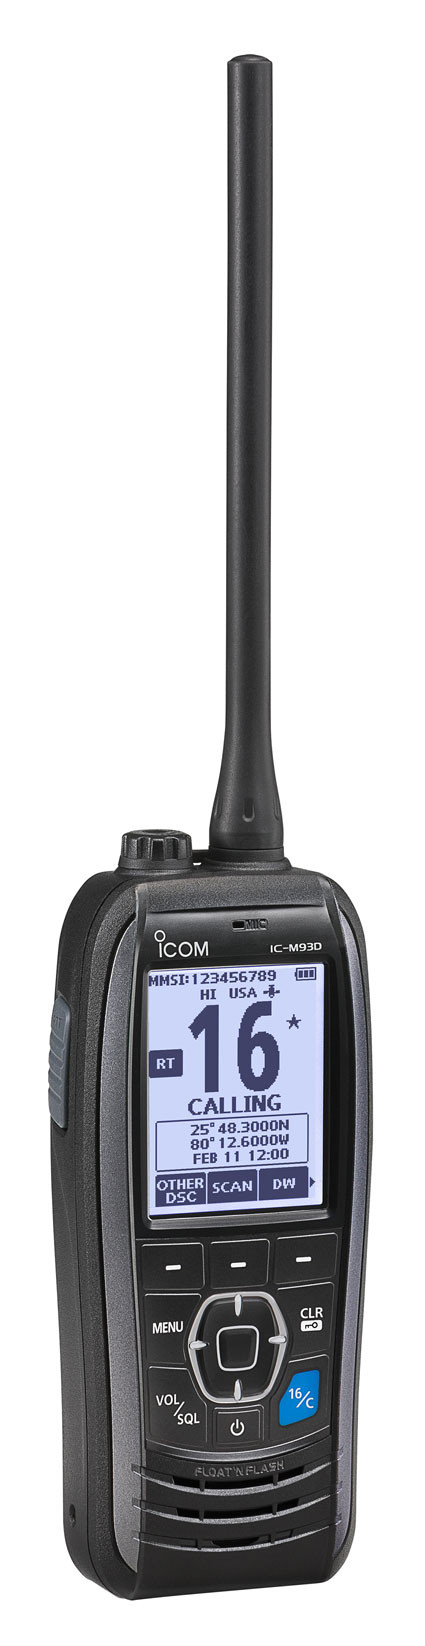 Icom IC-M93D VHF Radio w/ DSC